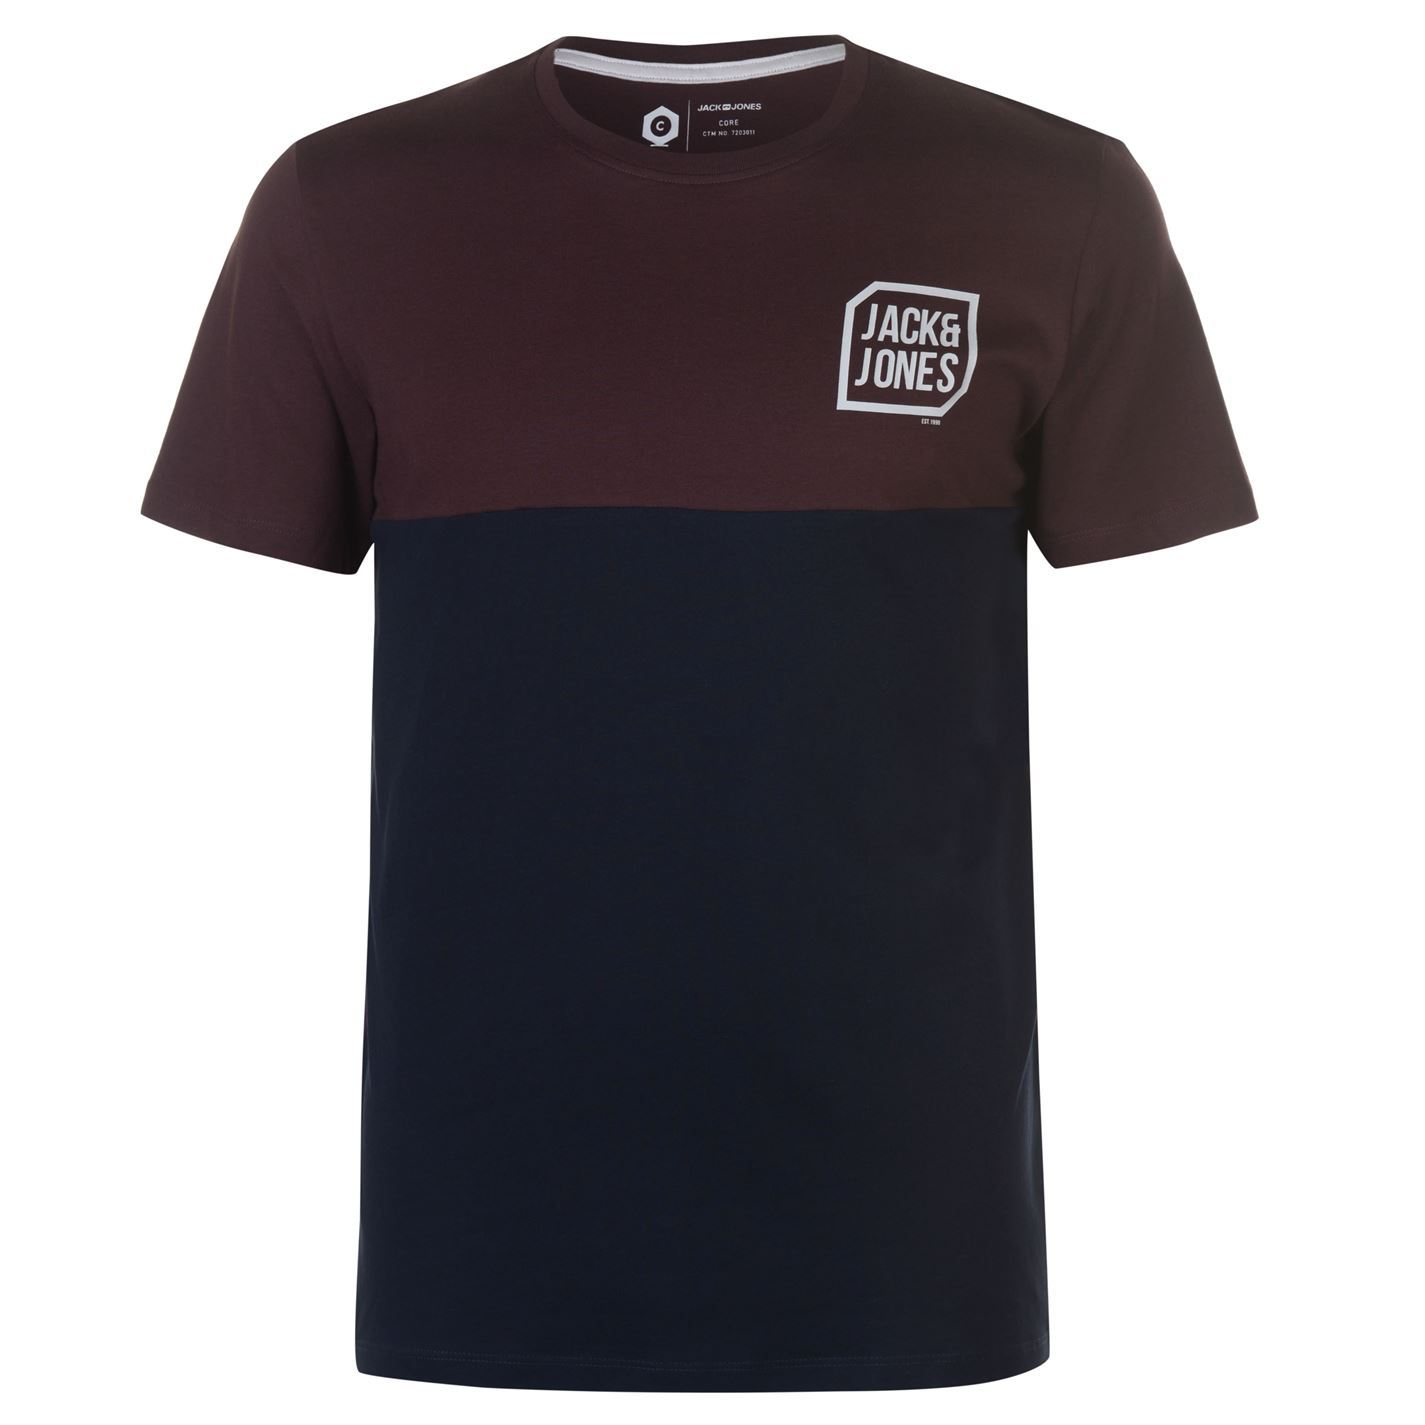 Jack-and-Jones-Core-Tern-T-Shirt-Mens-Tee-Shirt-Top thumbnail 10